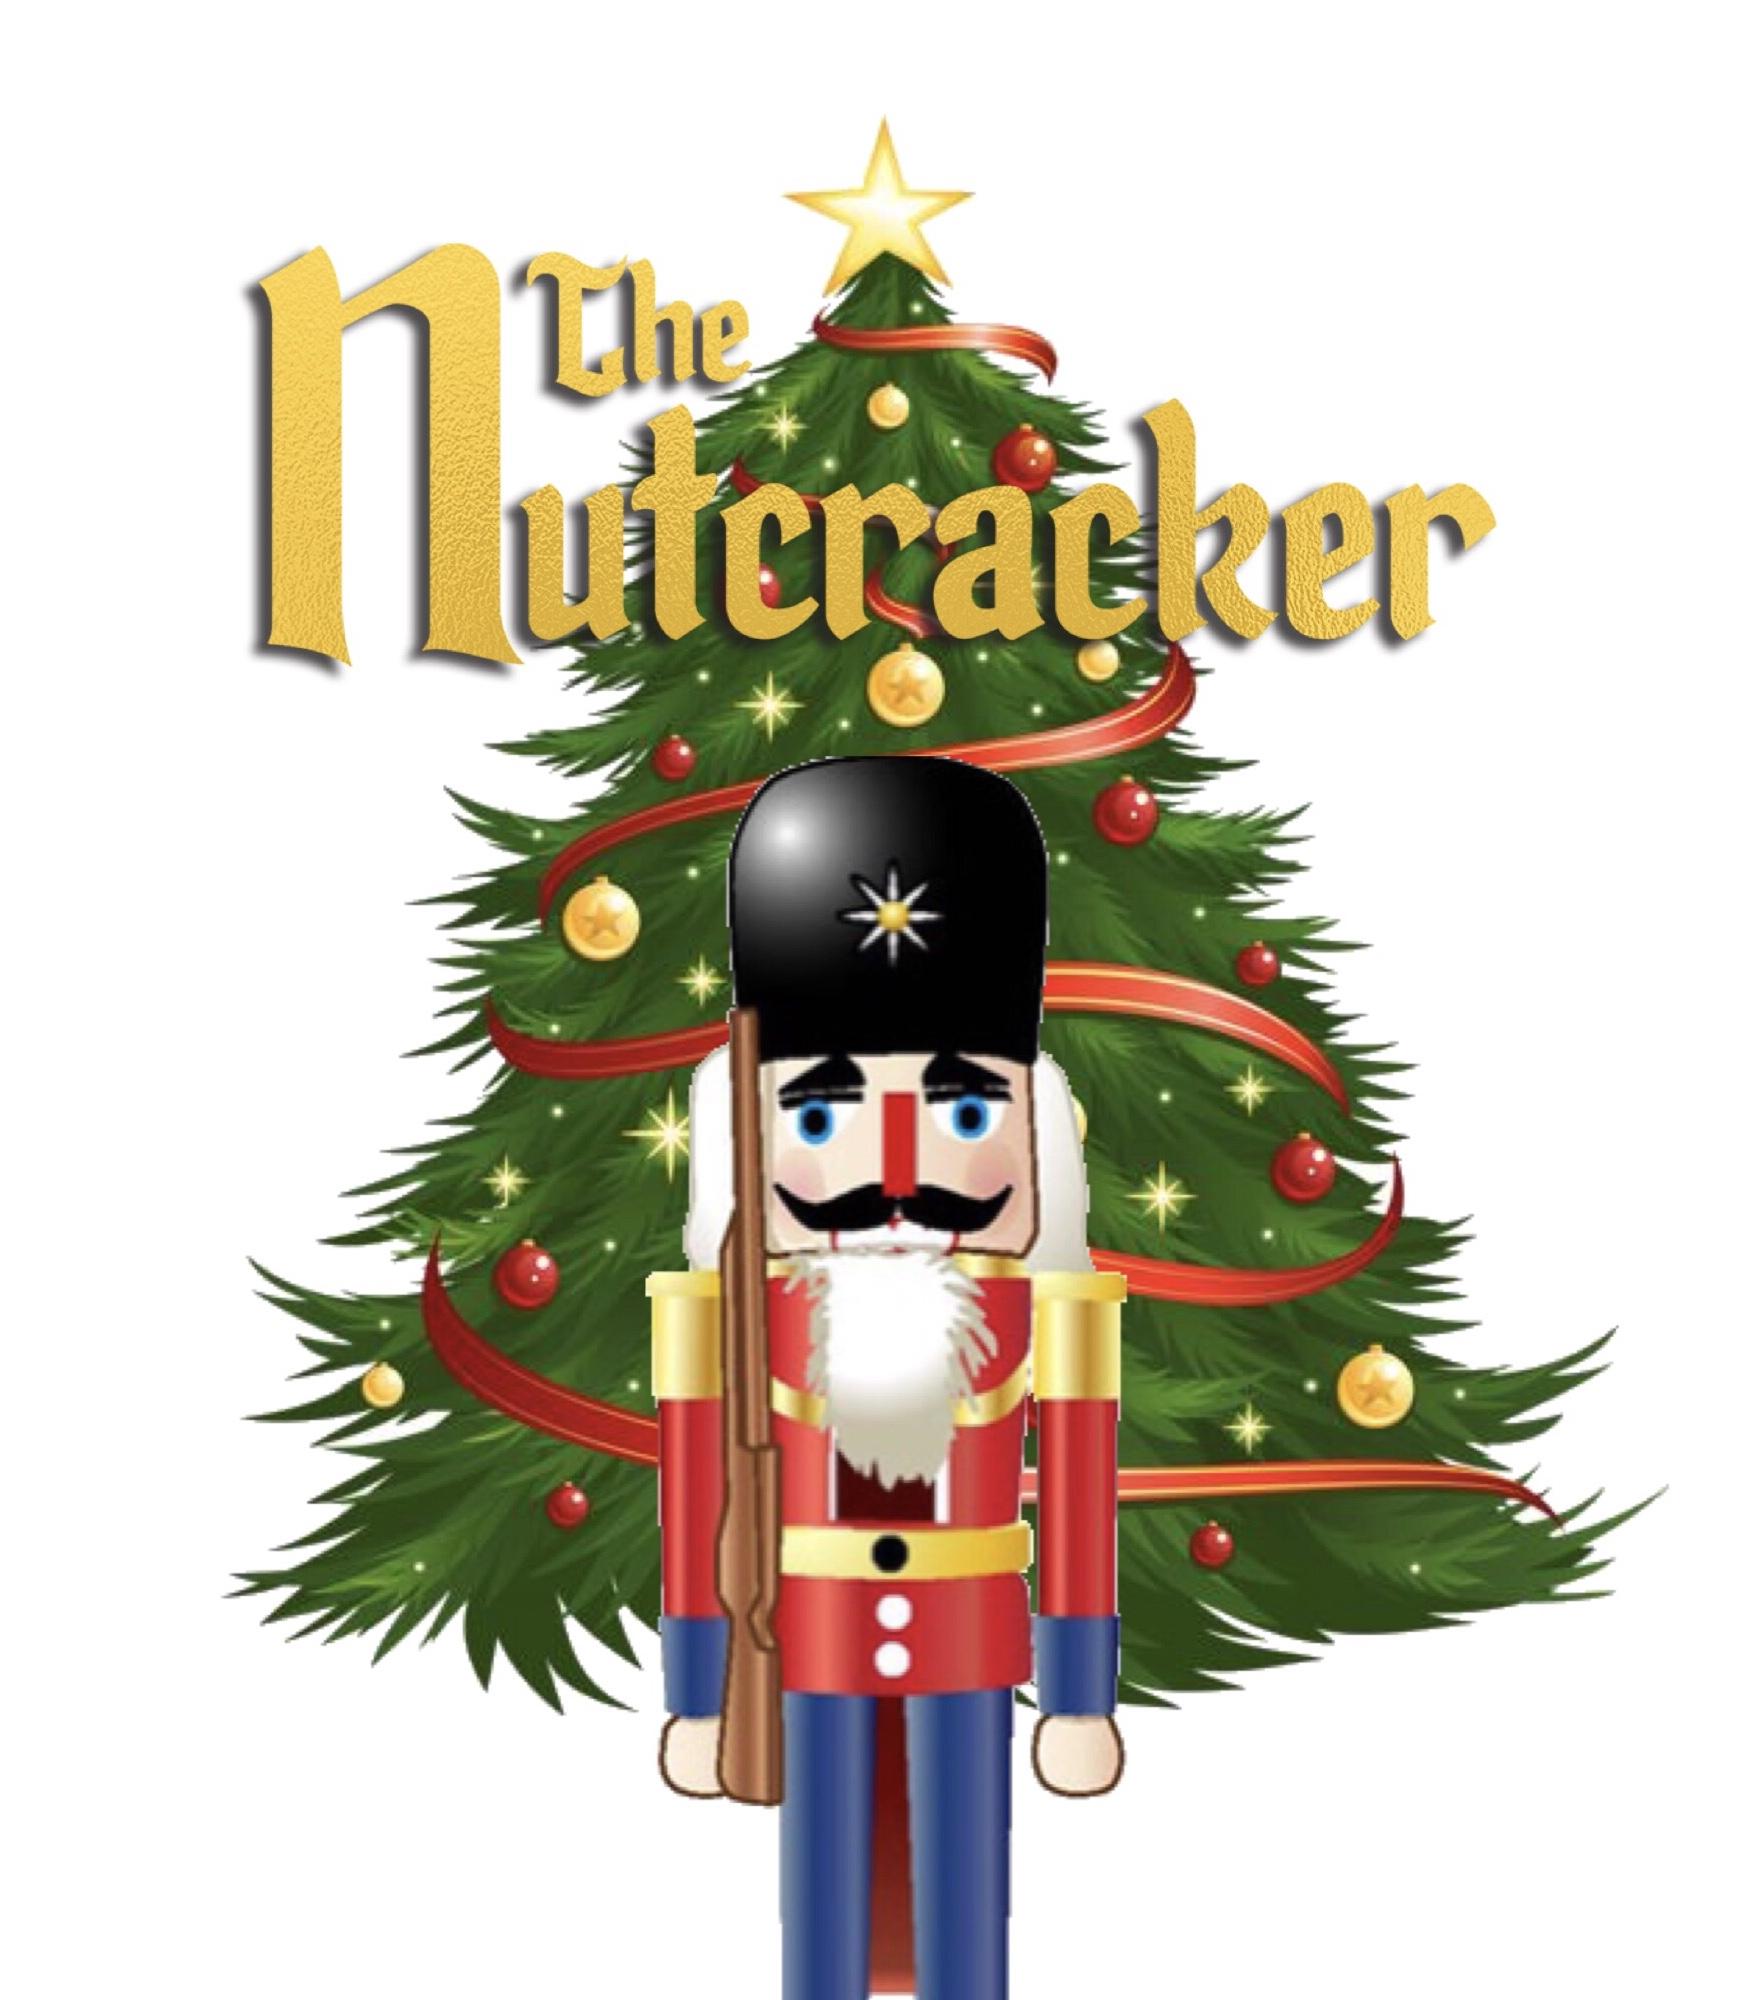 Nutcracker Christmas Tree Clipart.Nutcracker Arena S Dance Company